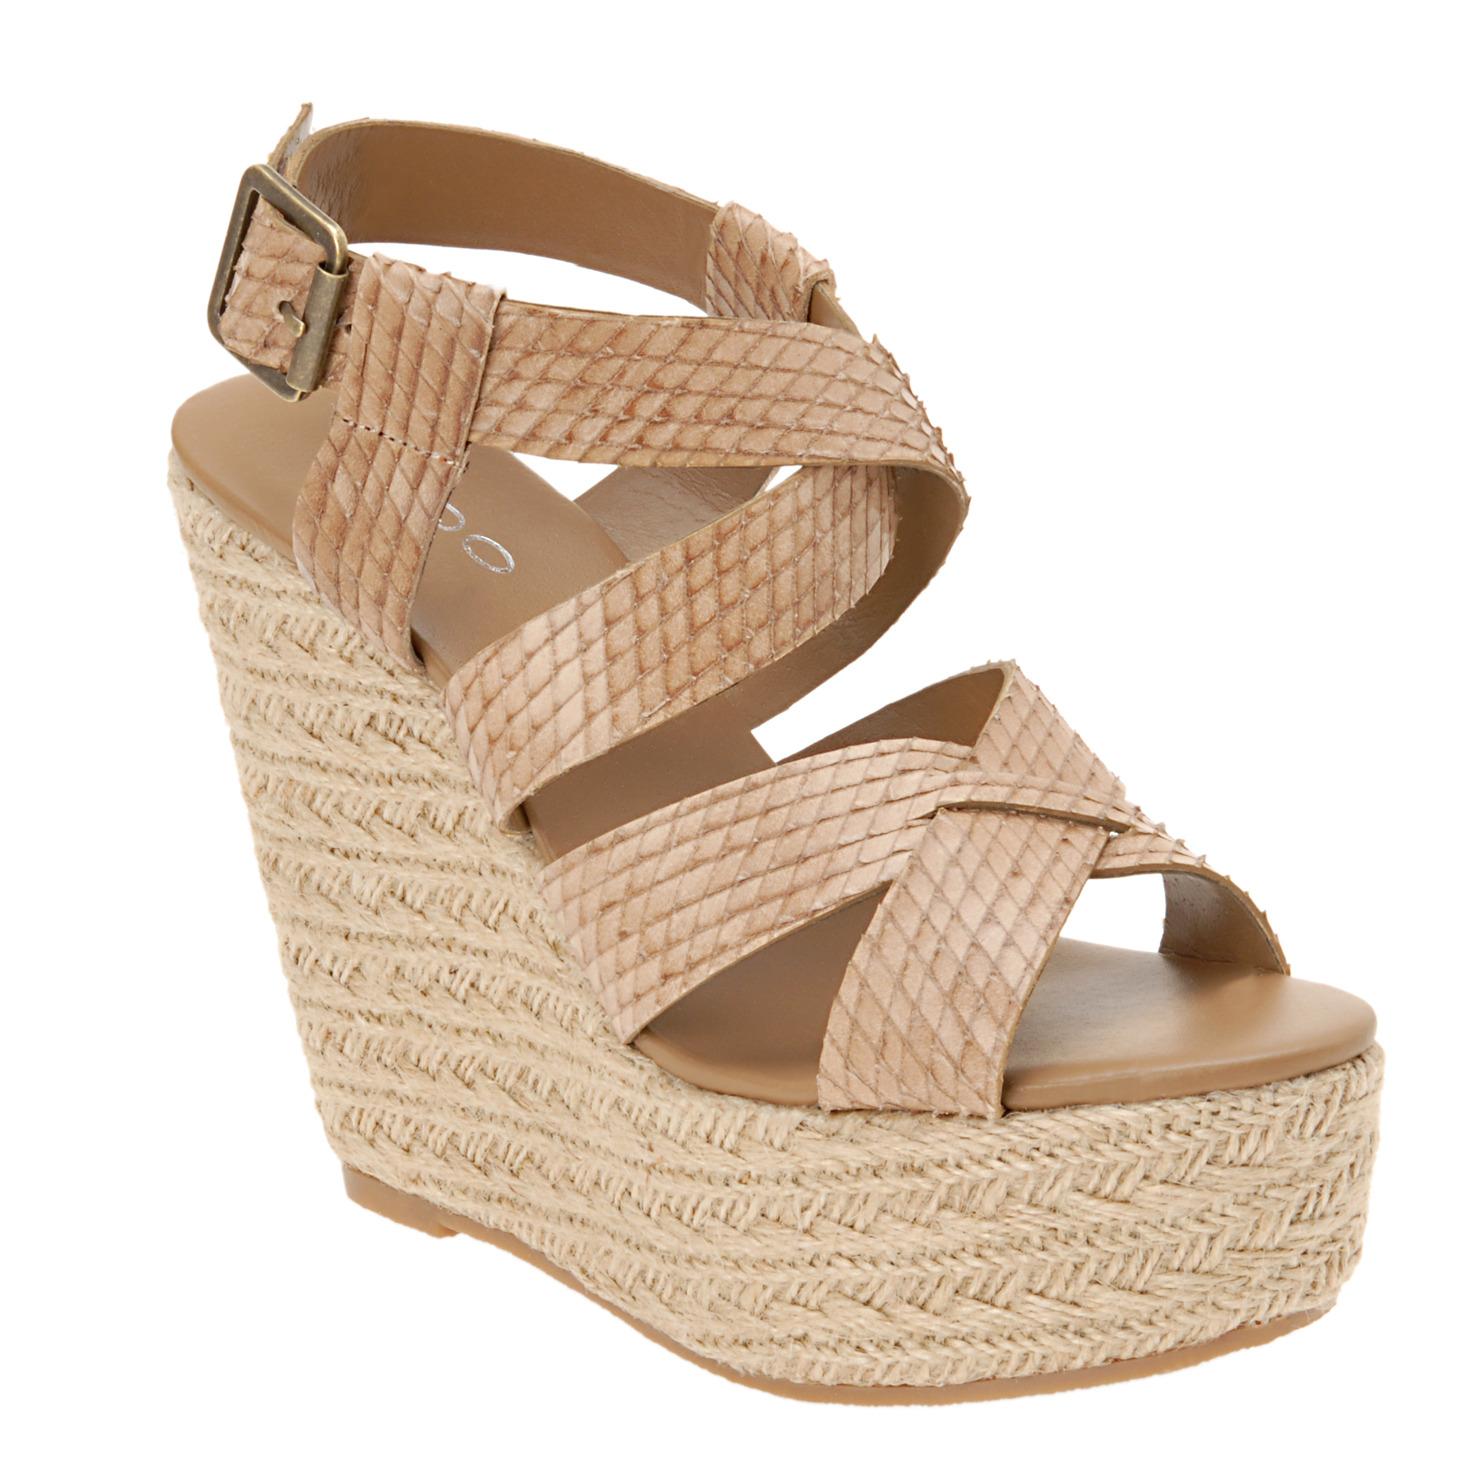 http://2.bp.blogspot.com/-YSouoAzz1JU/TZTwFZZ9d2I/AAAAAAAAAA0/WApdTAFt6Mo/s1600/shoe.jpg